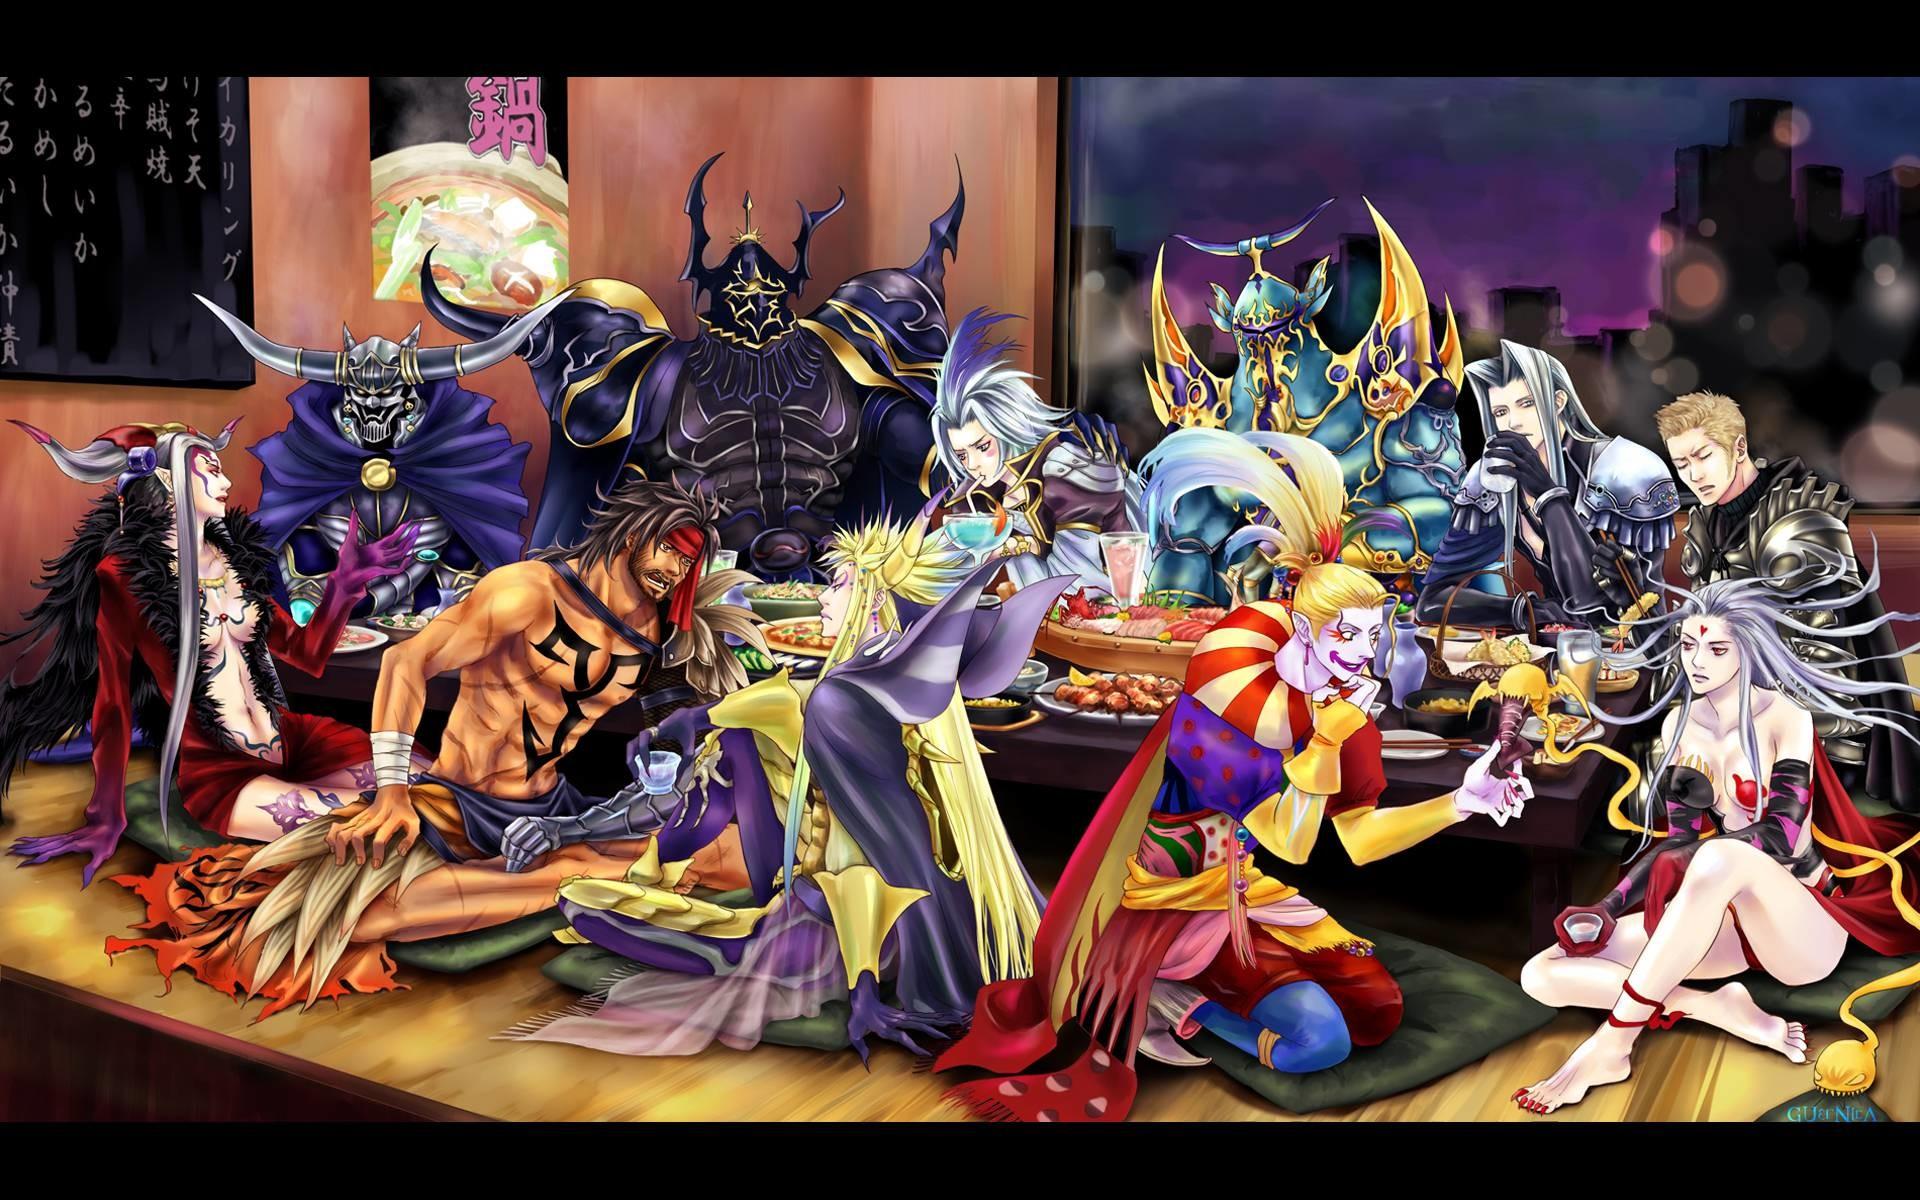 Final Fantasy X Wallpaper Hd